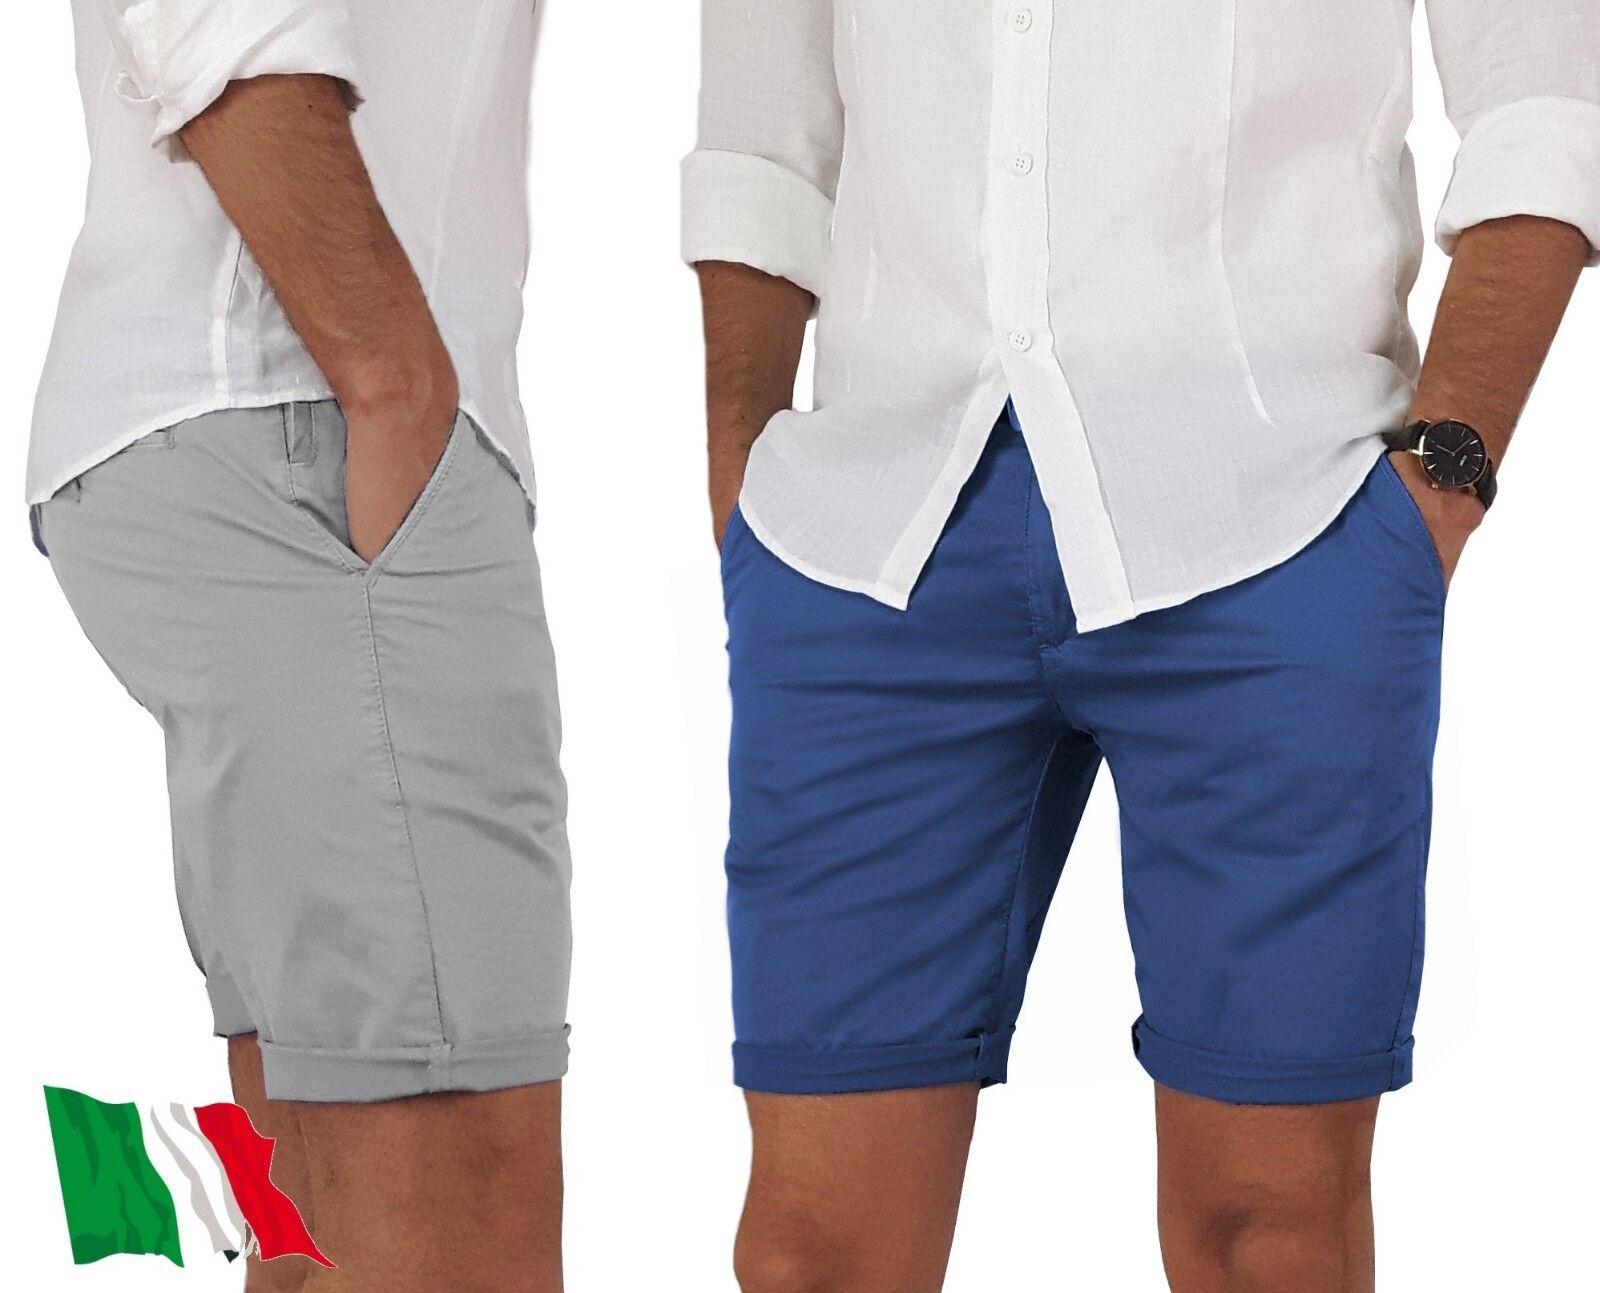 Bermuda uomo pantaloni corti pantaloncini tasche america MADE IN ITALY 44 54